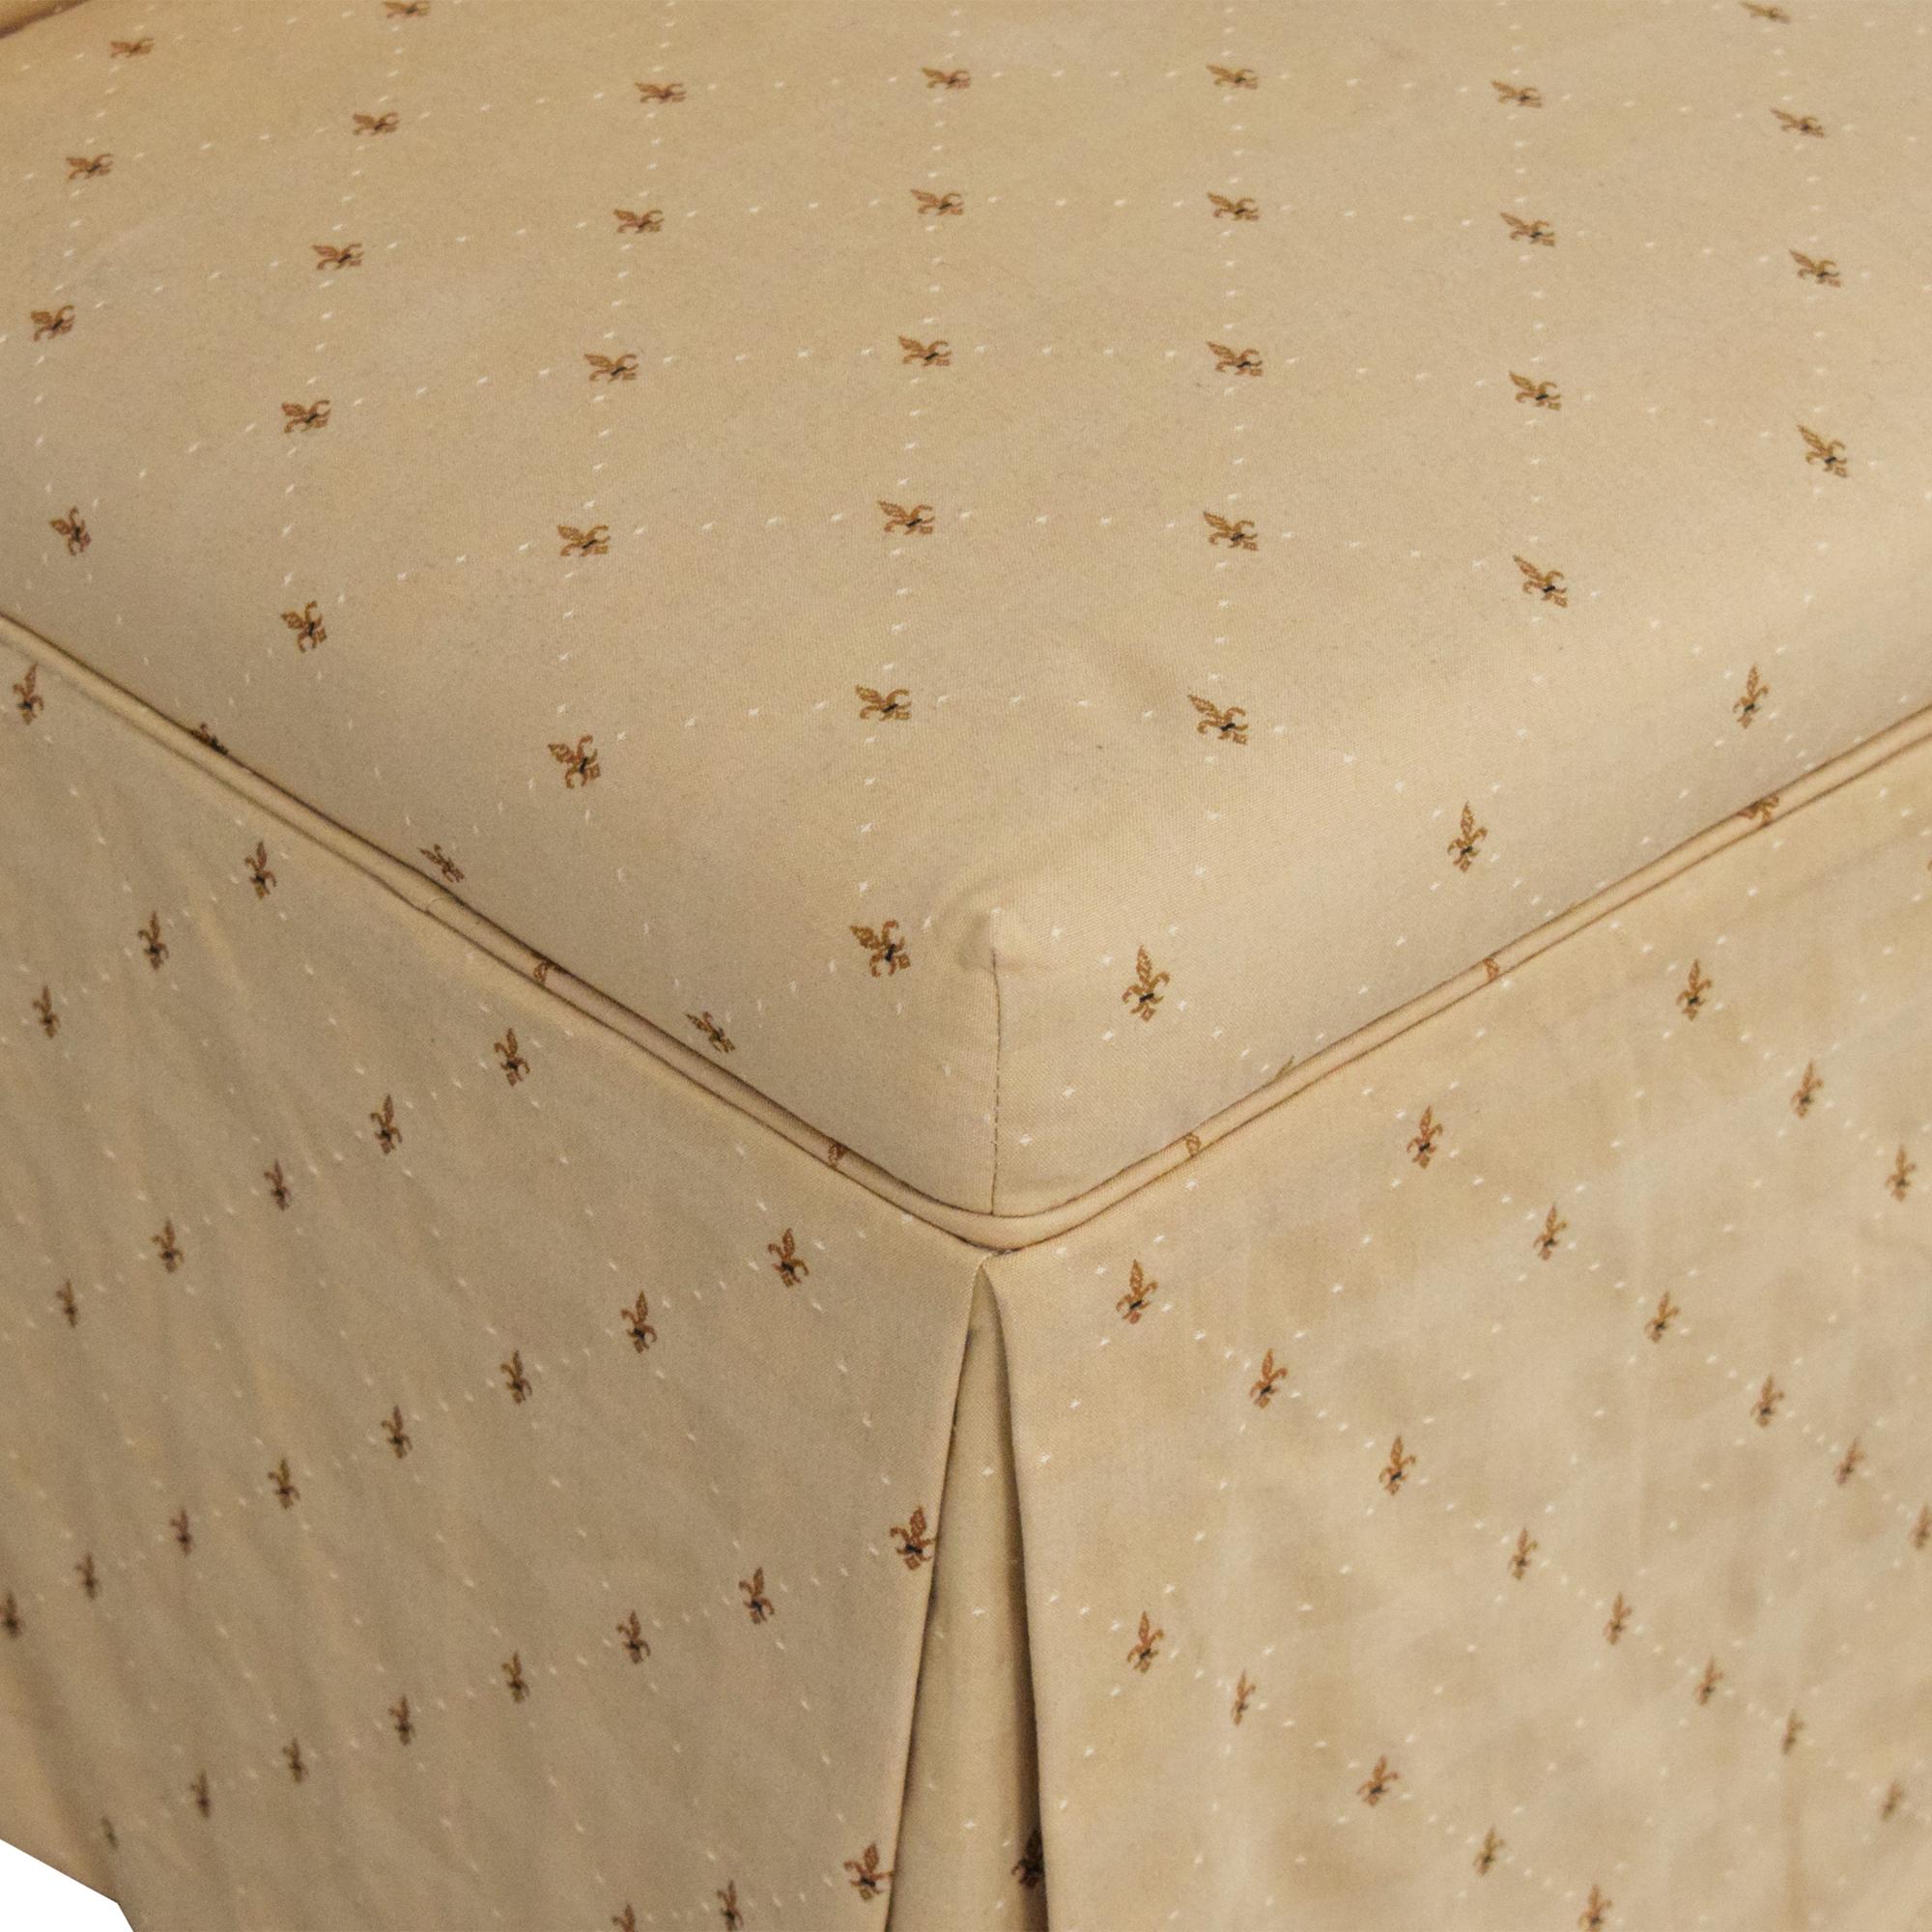 Ballard Designs Ballard Designs Fleur De Lis Parsons Dining Chairs price